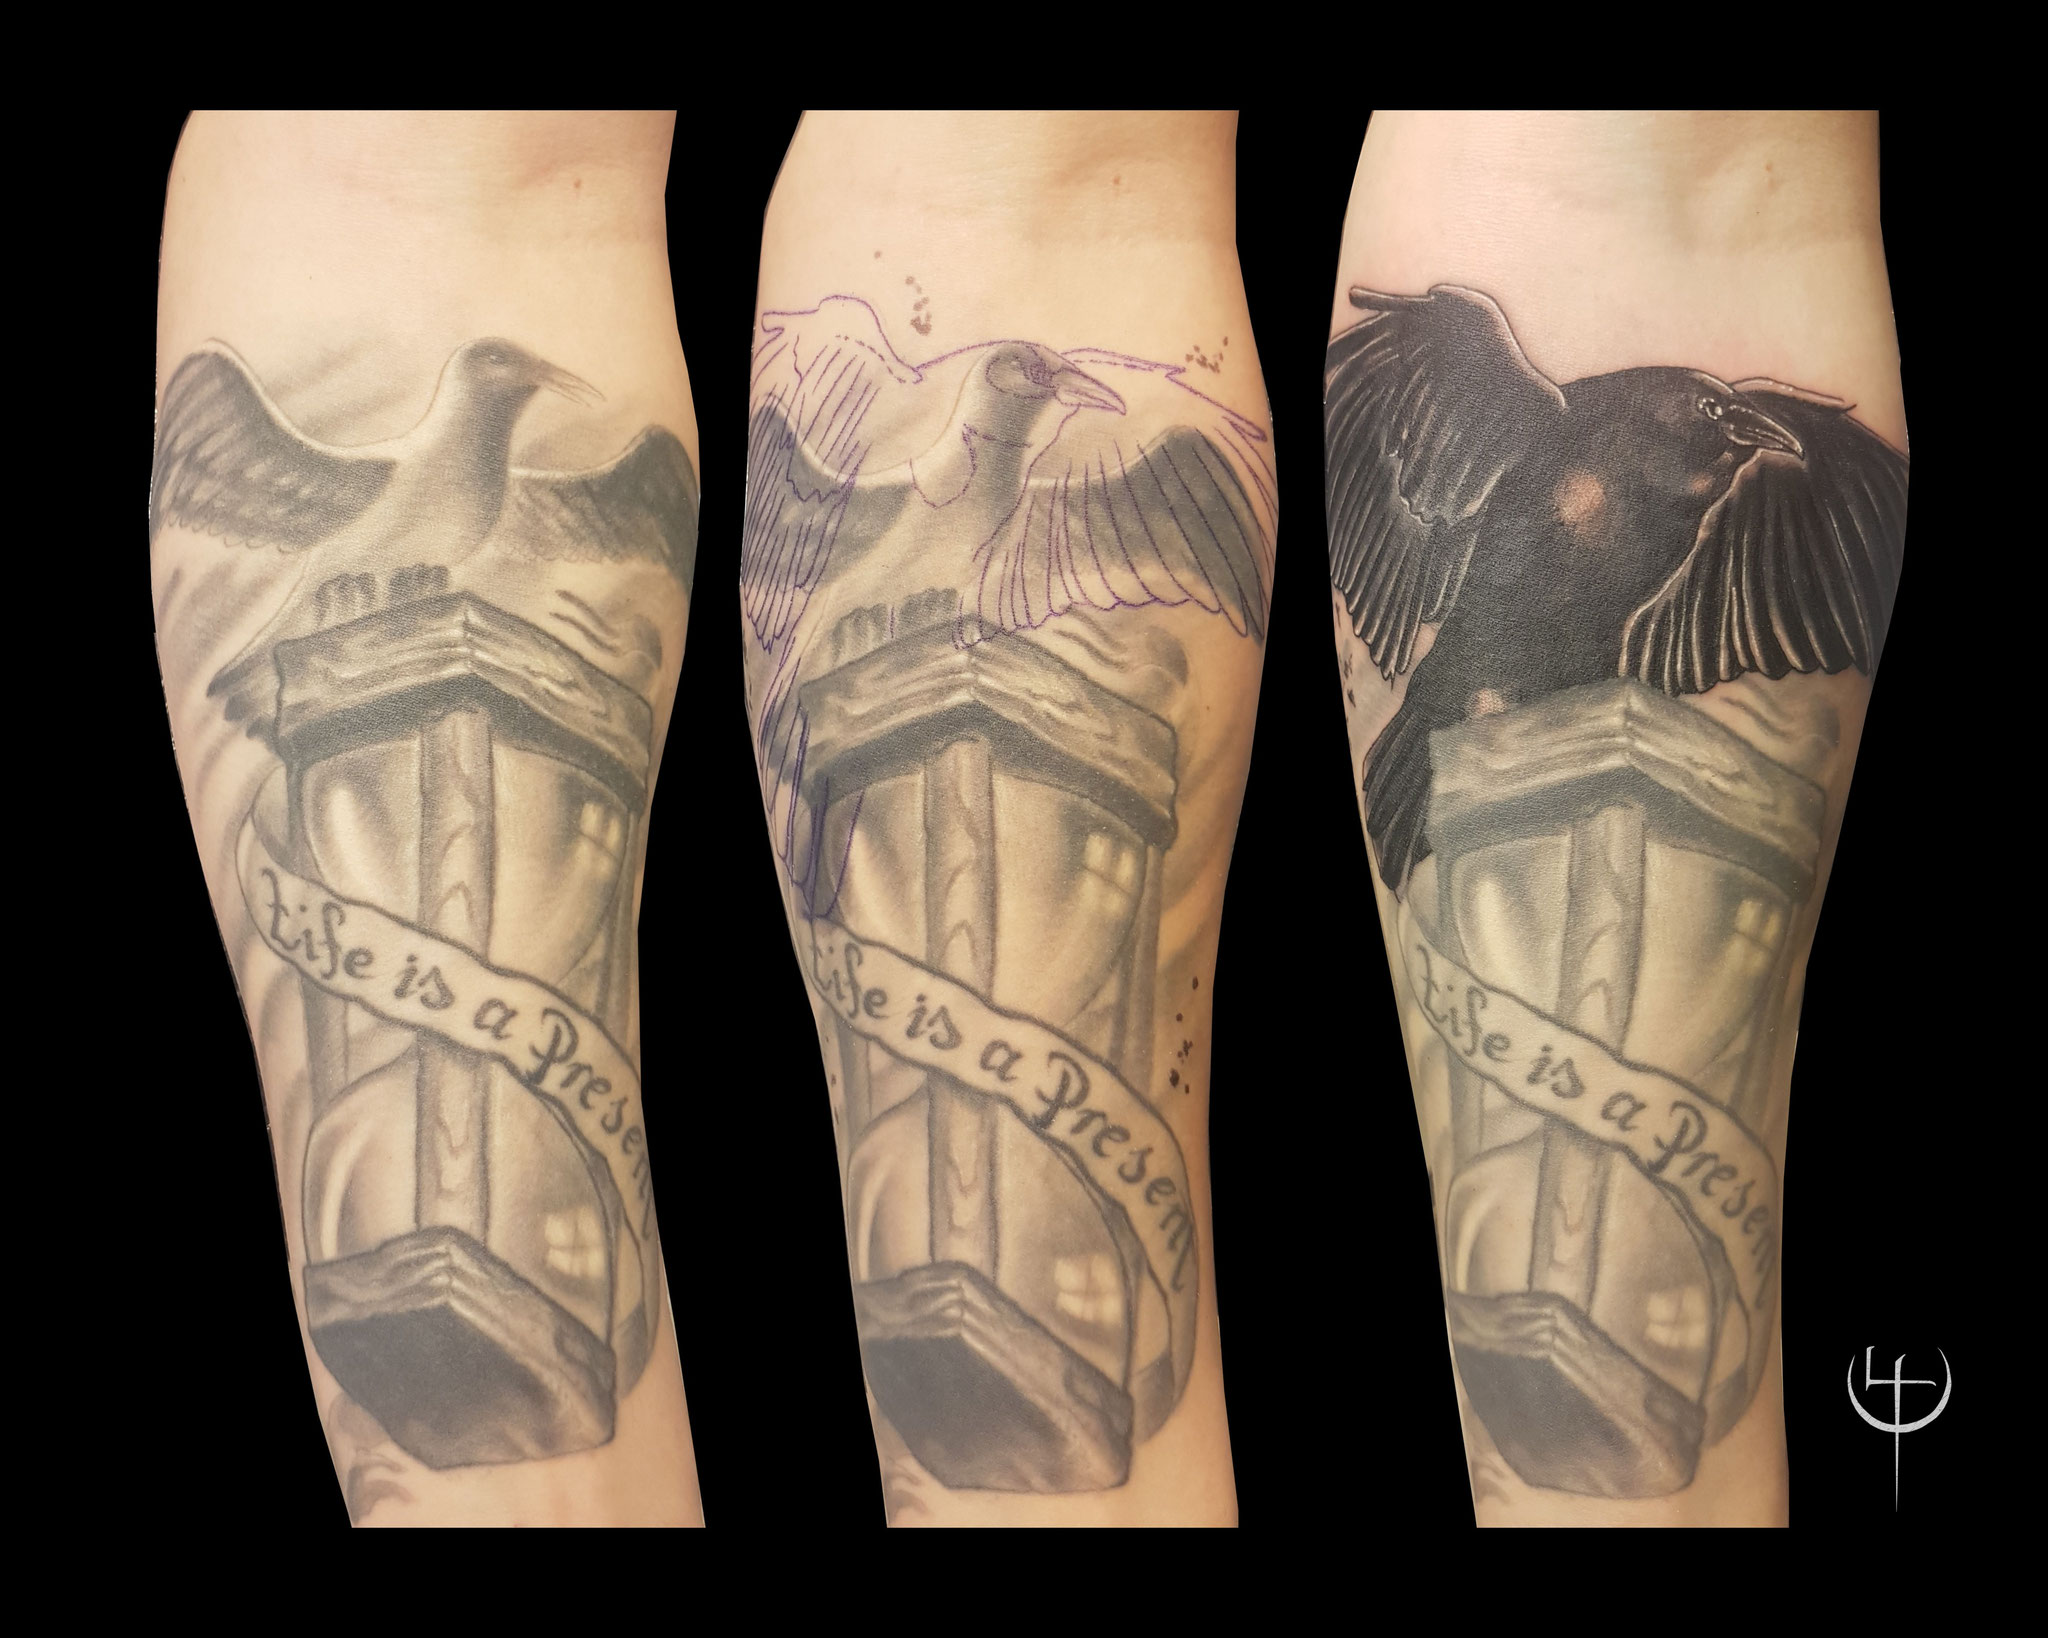 Teil-Cover, Cover-up, Unterarm, Raven